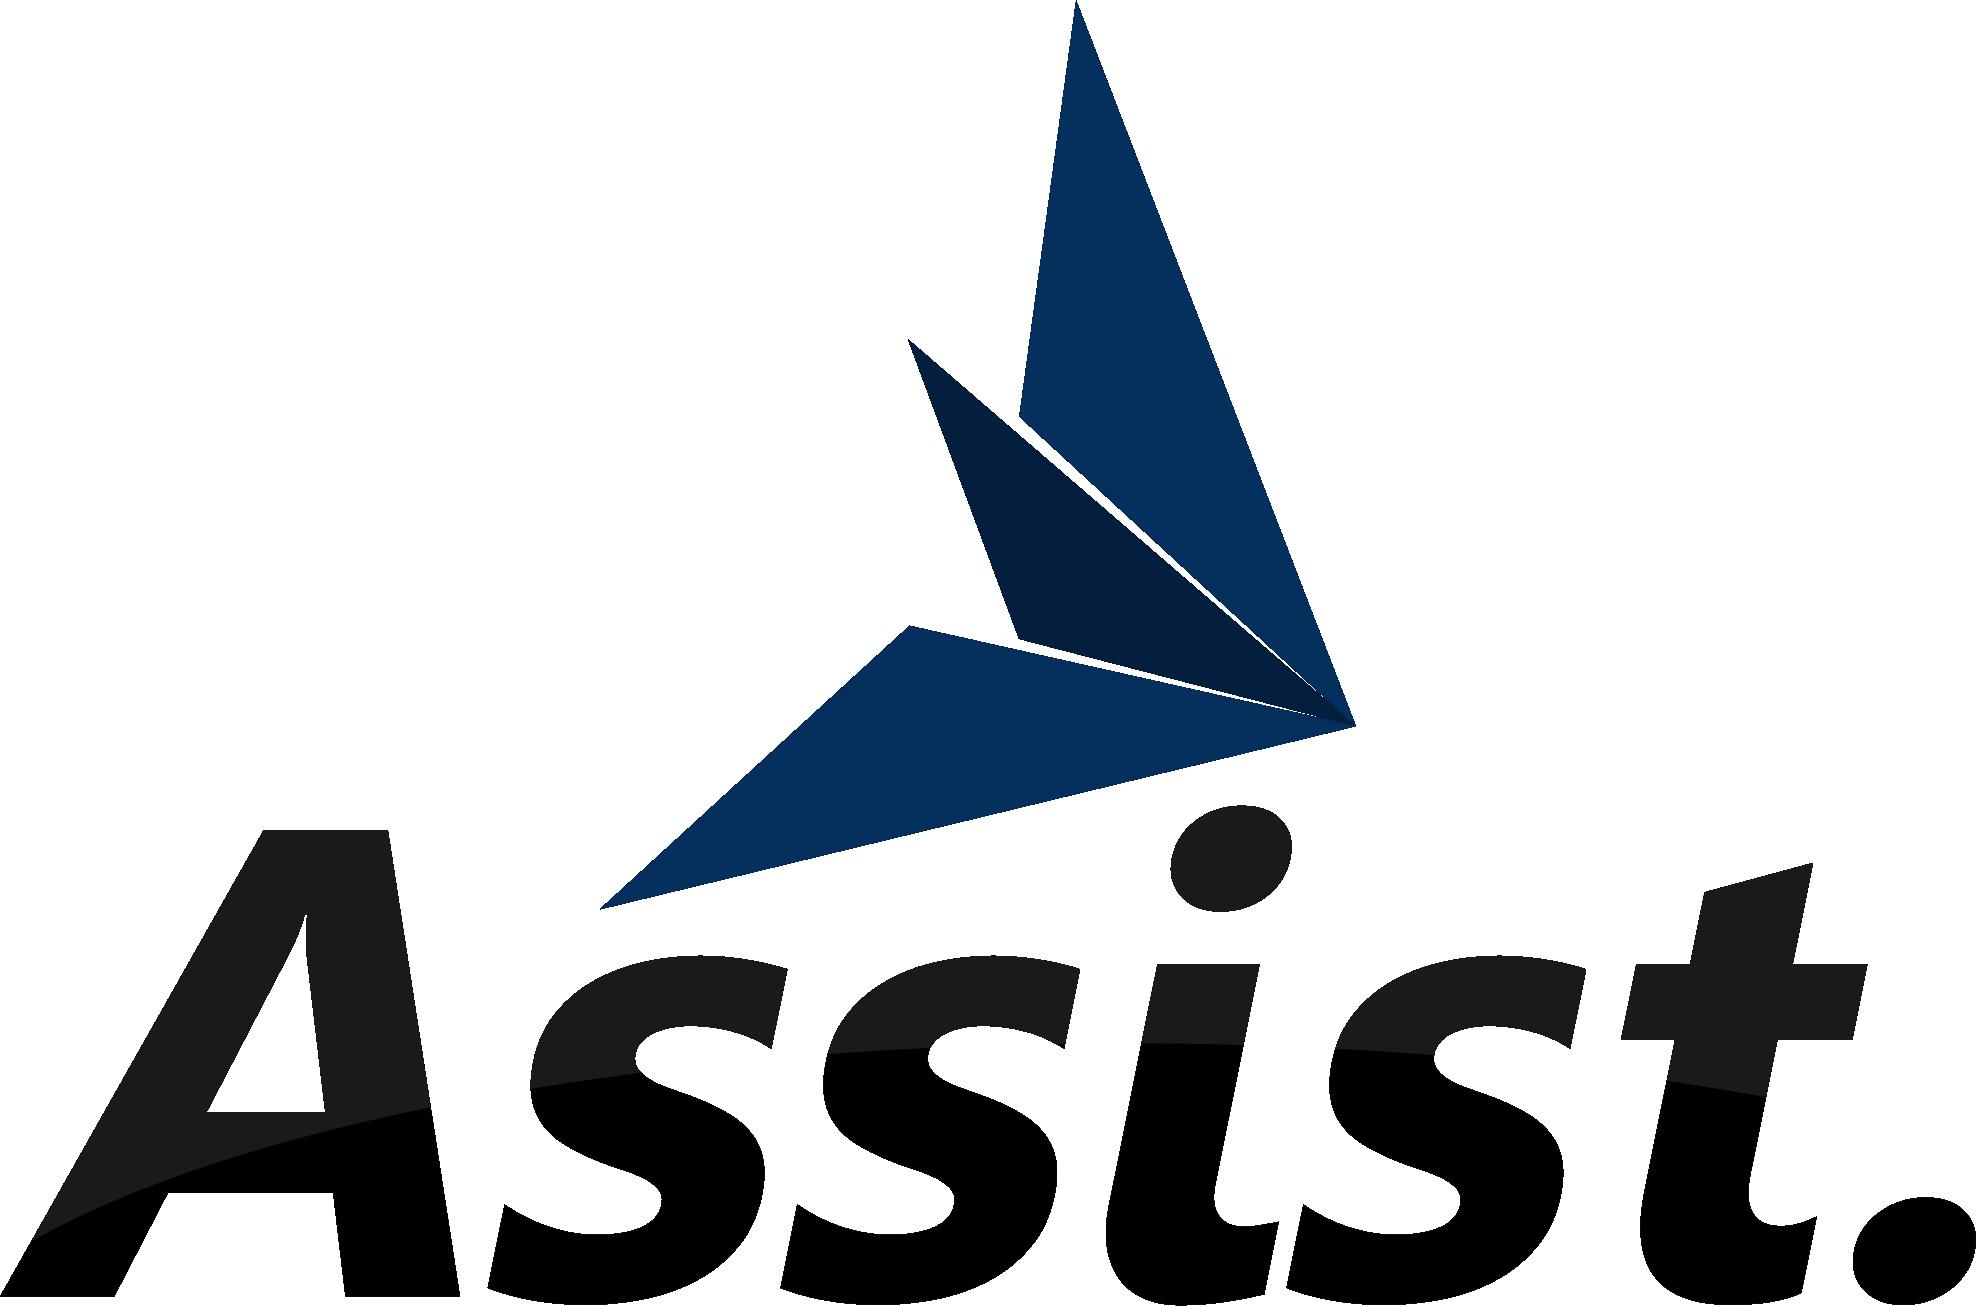 Corporate logo design for Assist./企業ロゴのデザインをお願いします